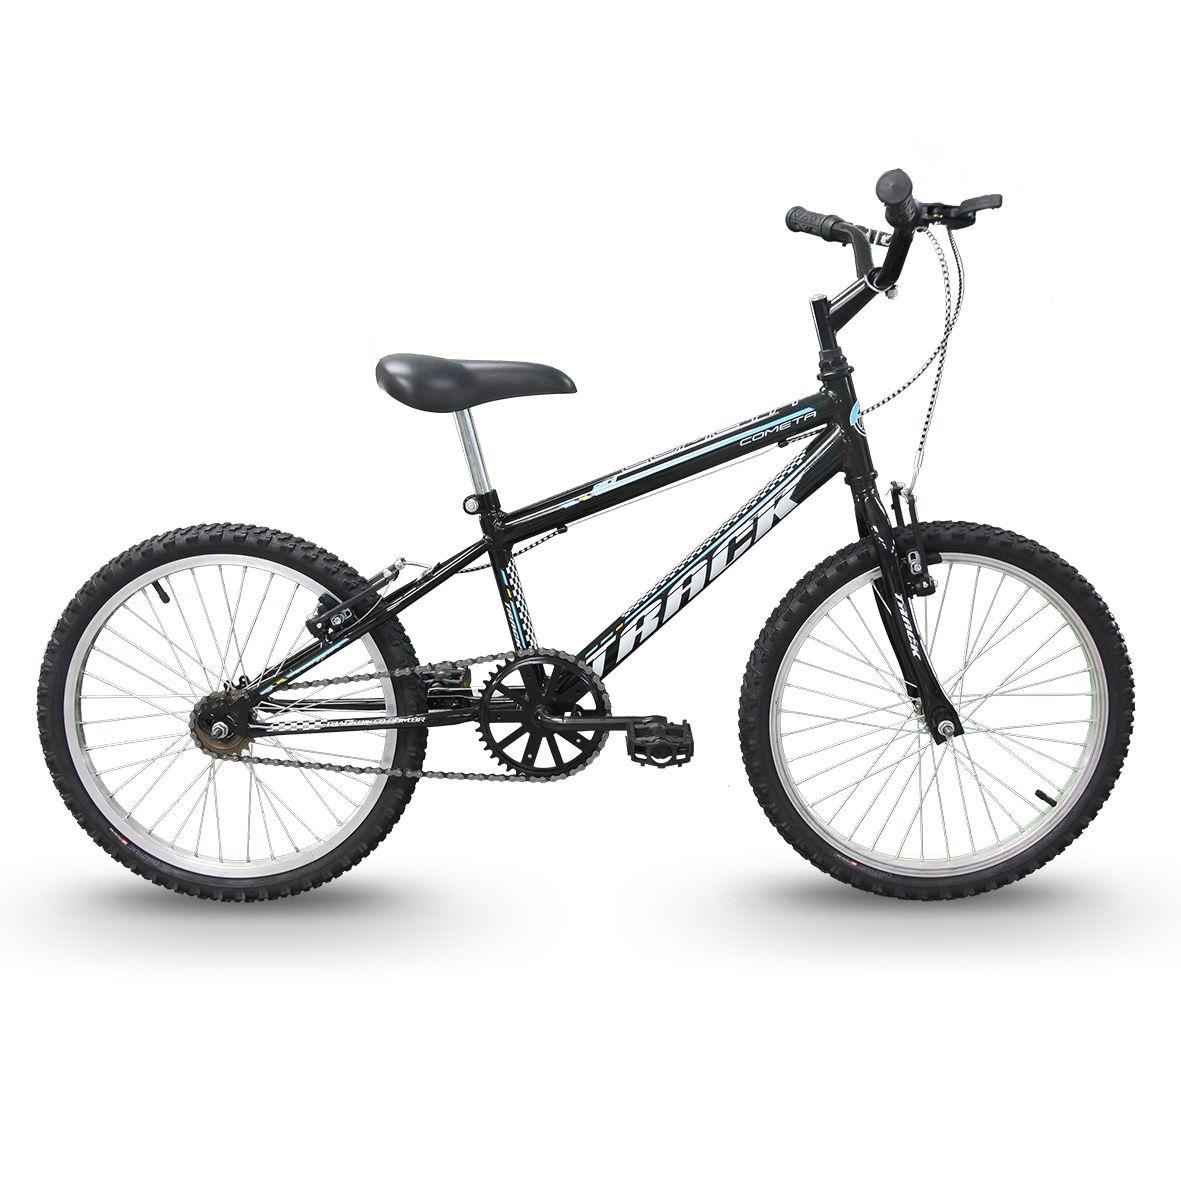 Bicicleta Track Bikes Cometa Juvenil Aro 20 Seminova